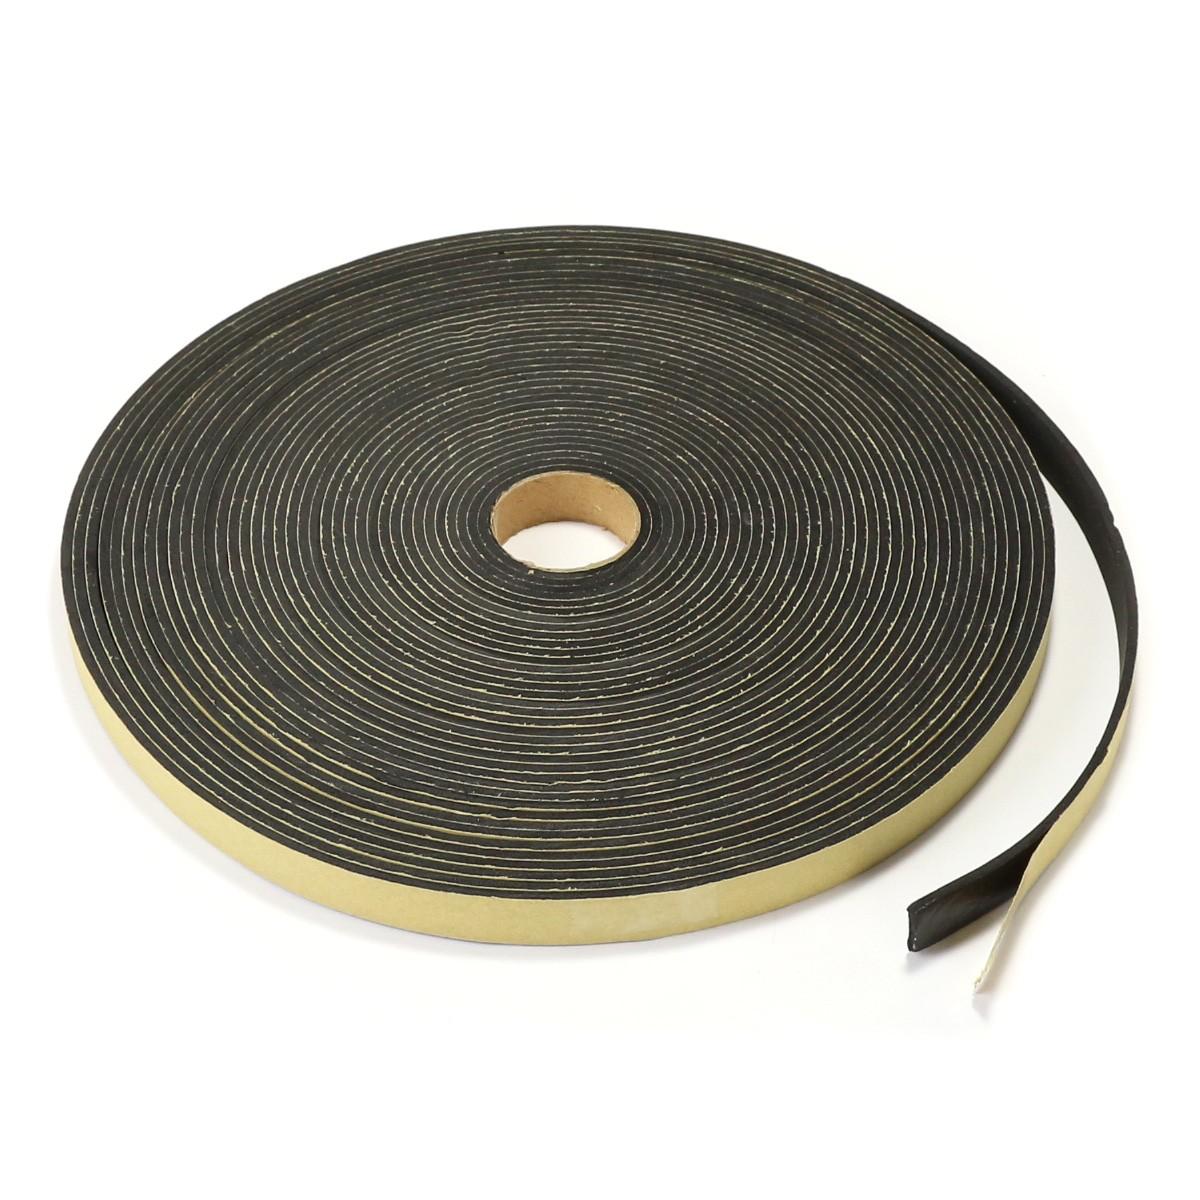 EVA Gasket for Speakers 10x1mm Black